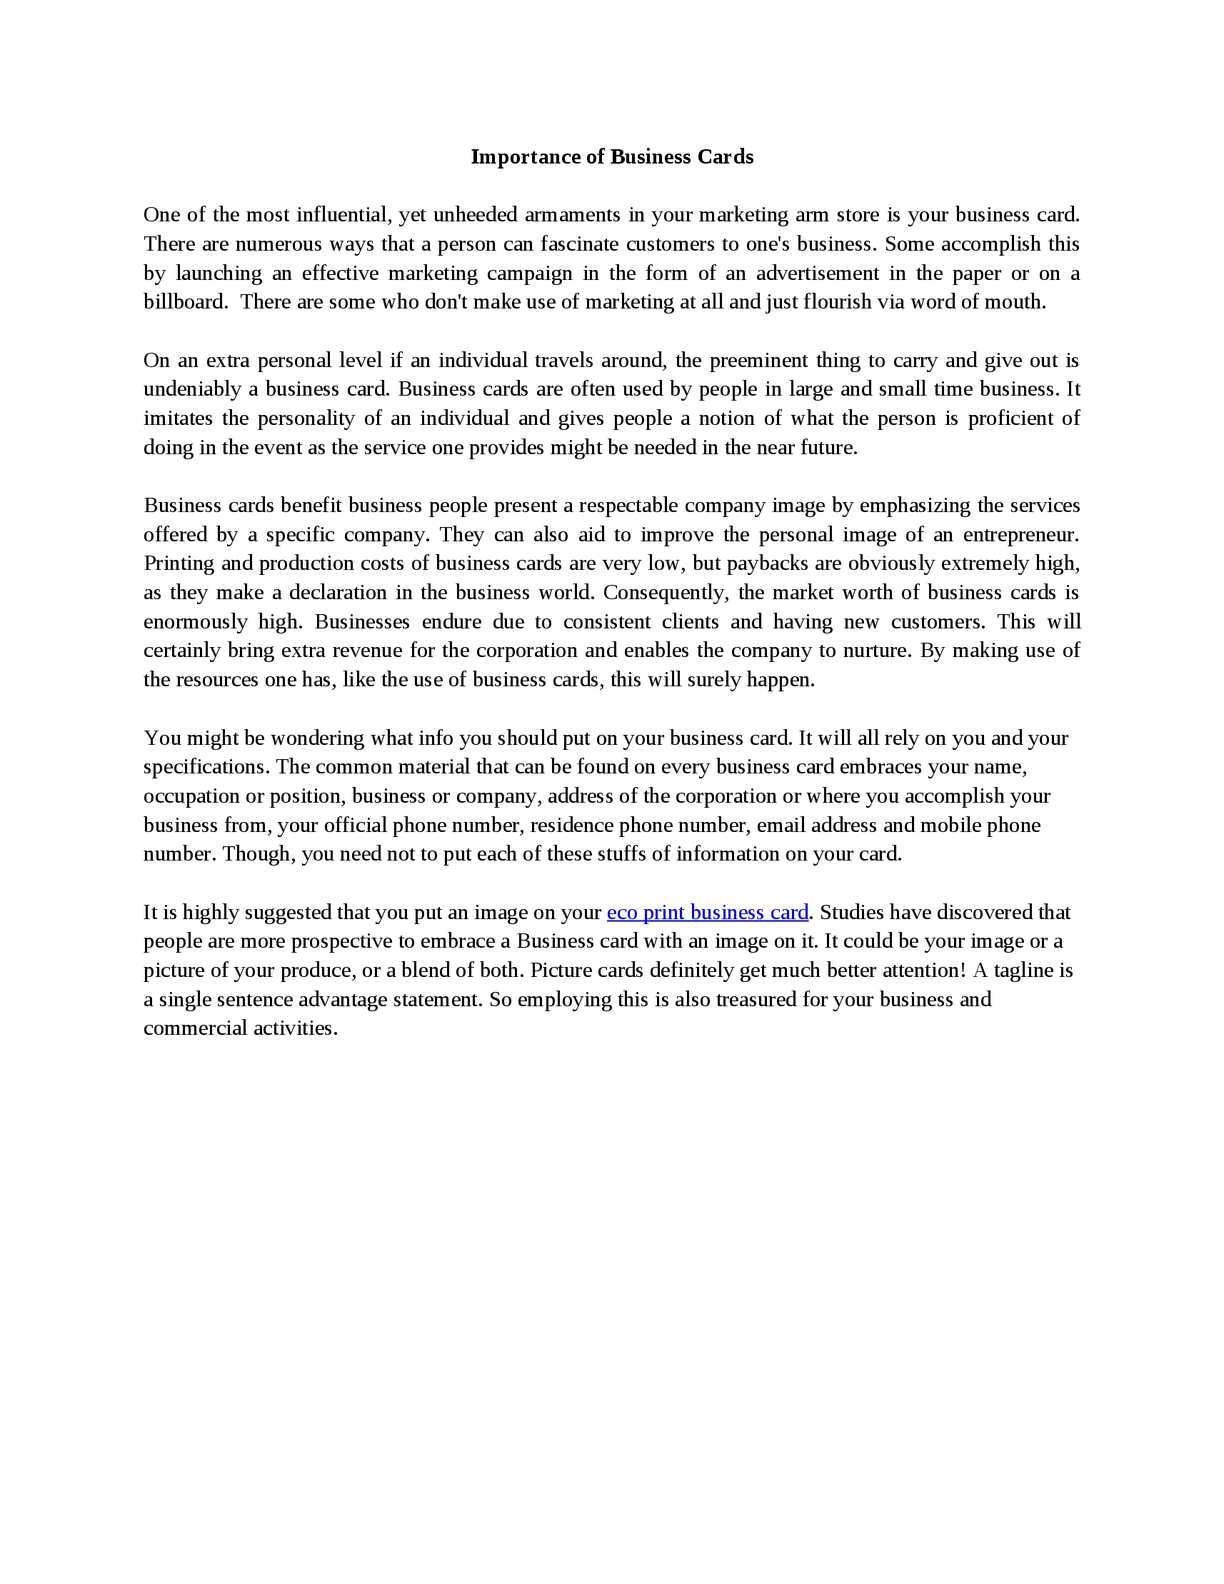 Calaméo - Importance of Business Cards